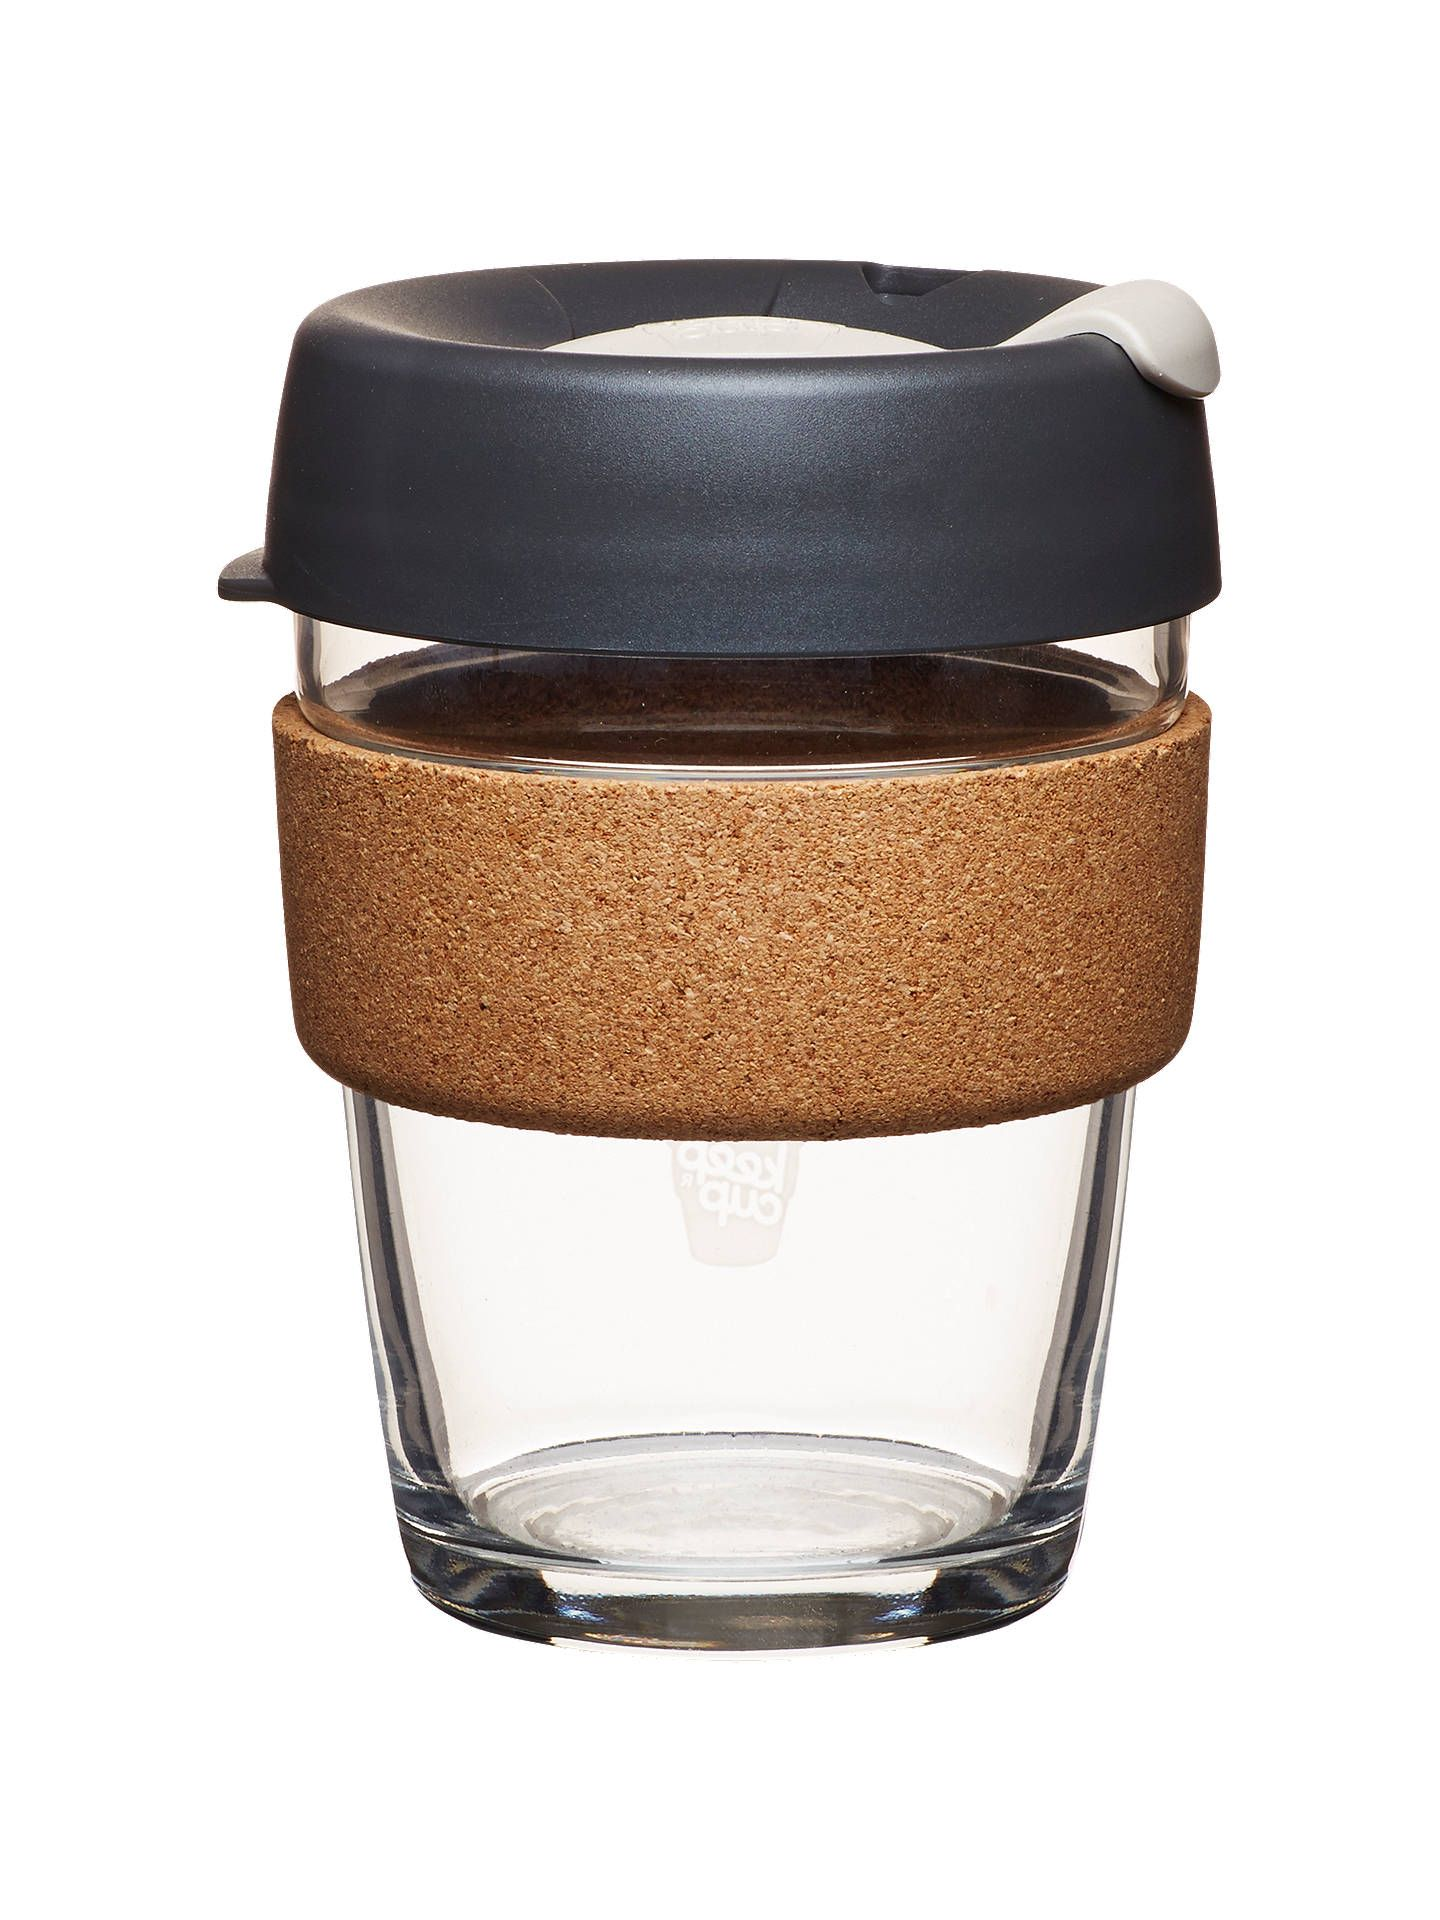 KeepCup Cork Brew Reusable 12oz Glass Coffee CupTravel Mug